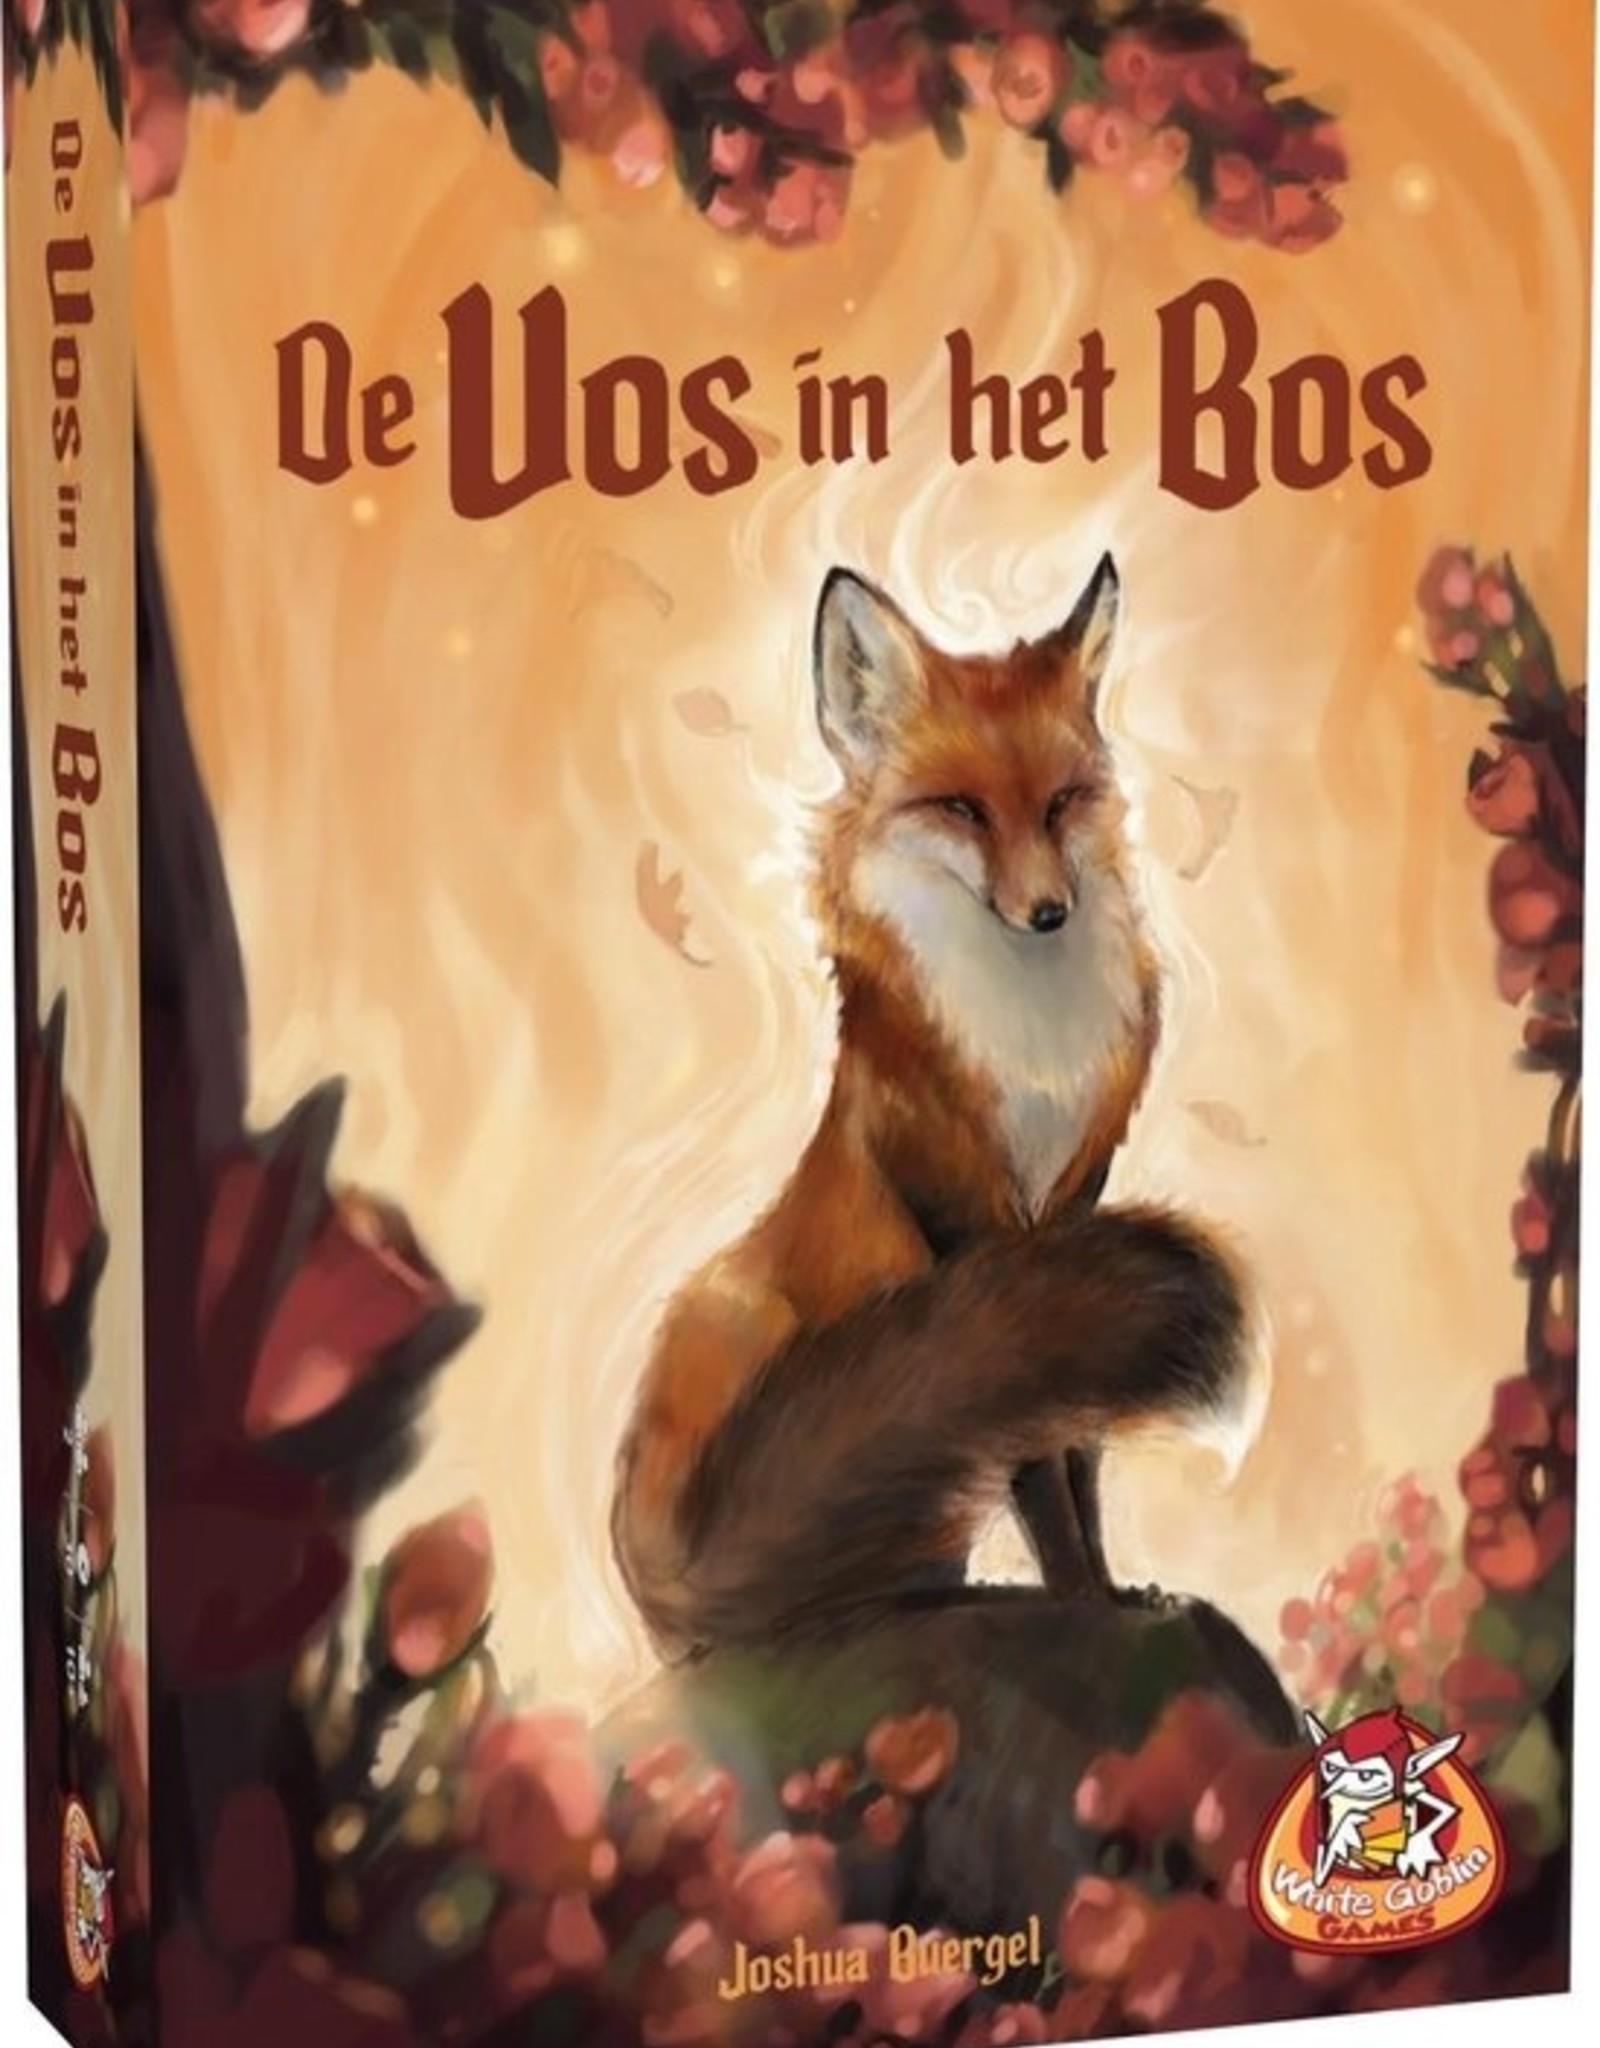 White goblins De vos in het bos - game  ( Dutch version)